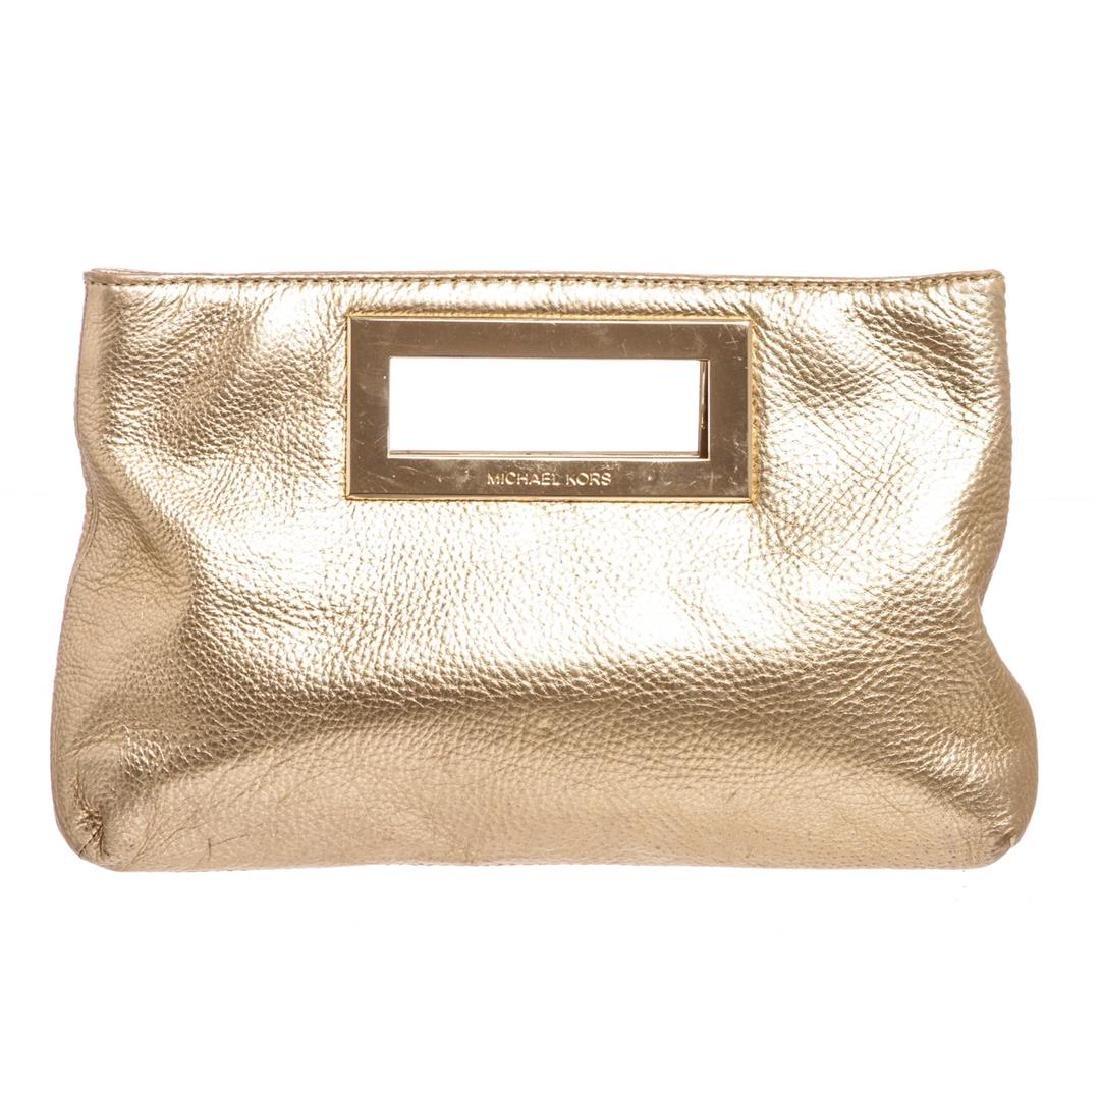 Michael Kors Pale Gold Leather Berkley Clutch Handbag